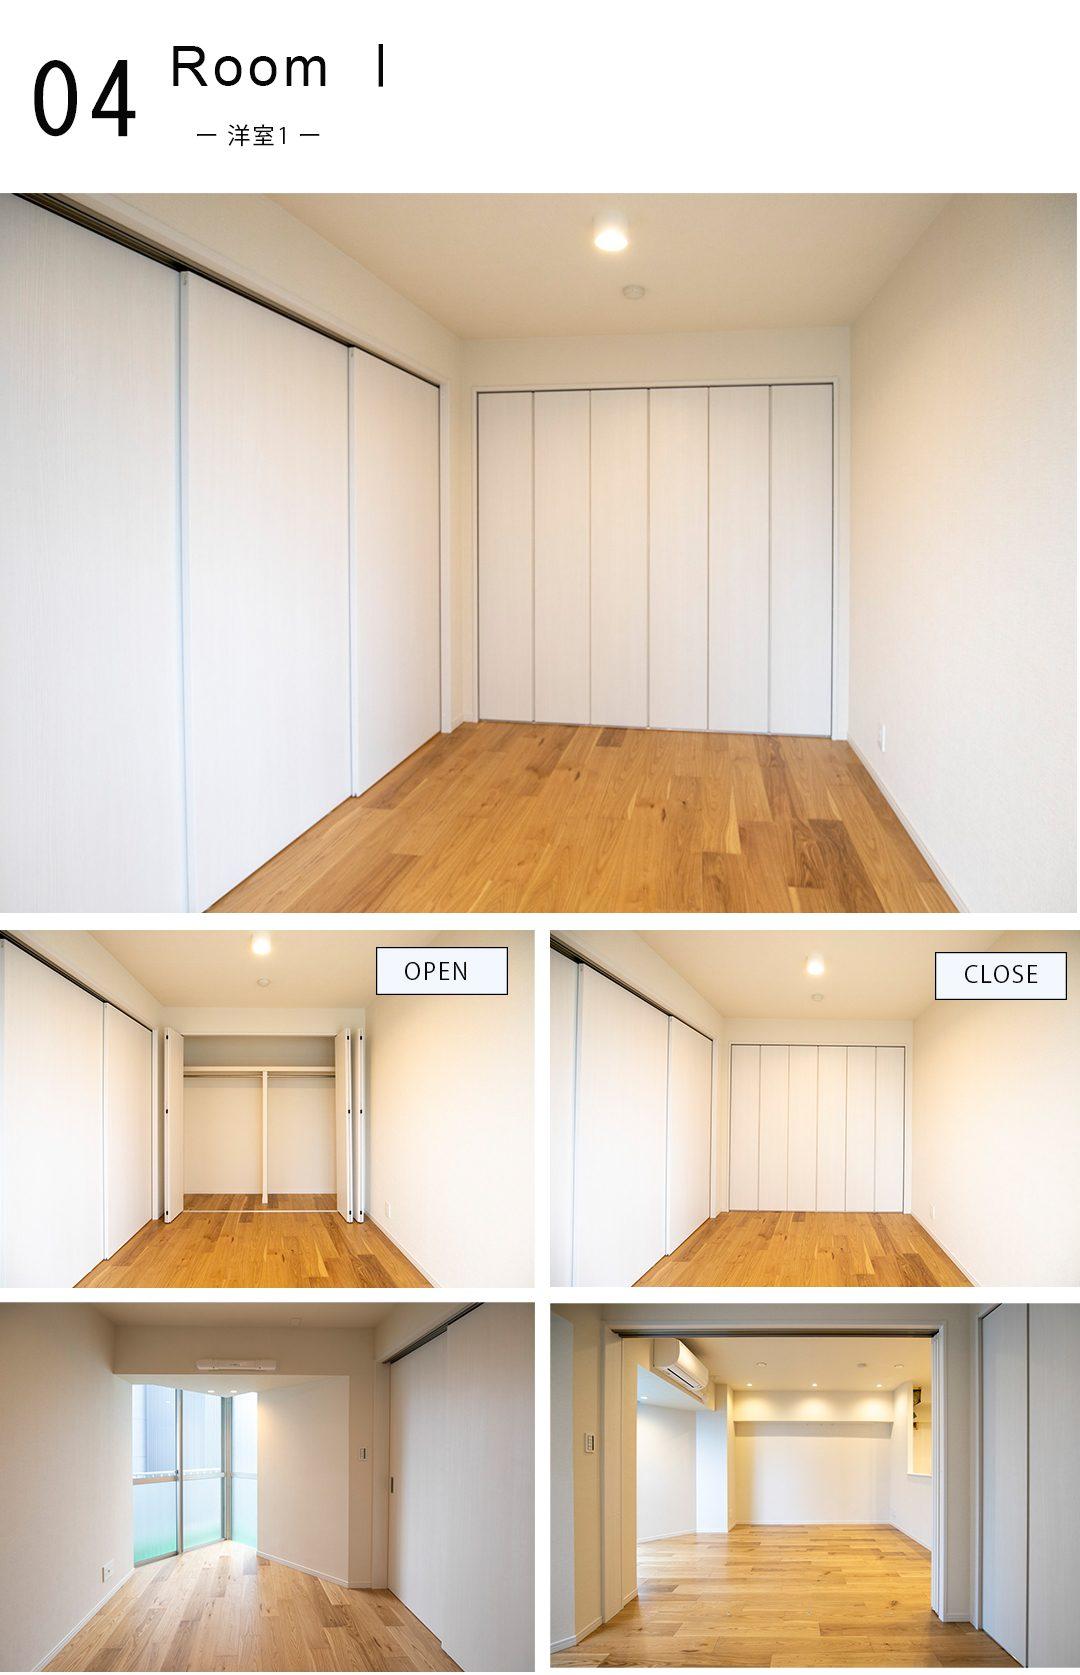 04,room1,洋室1